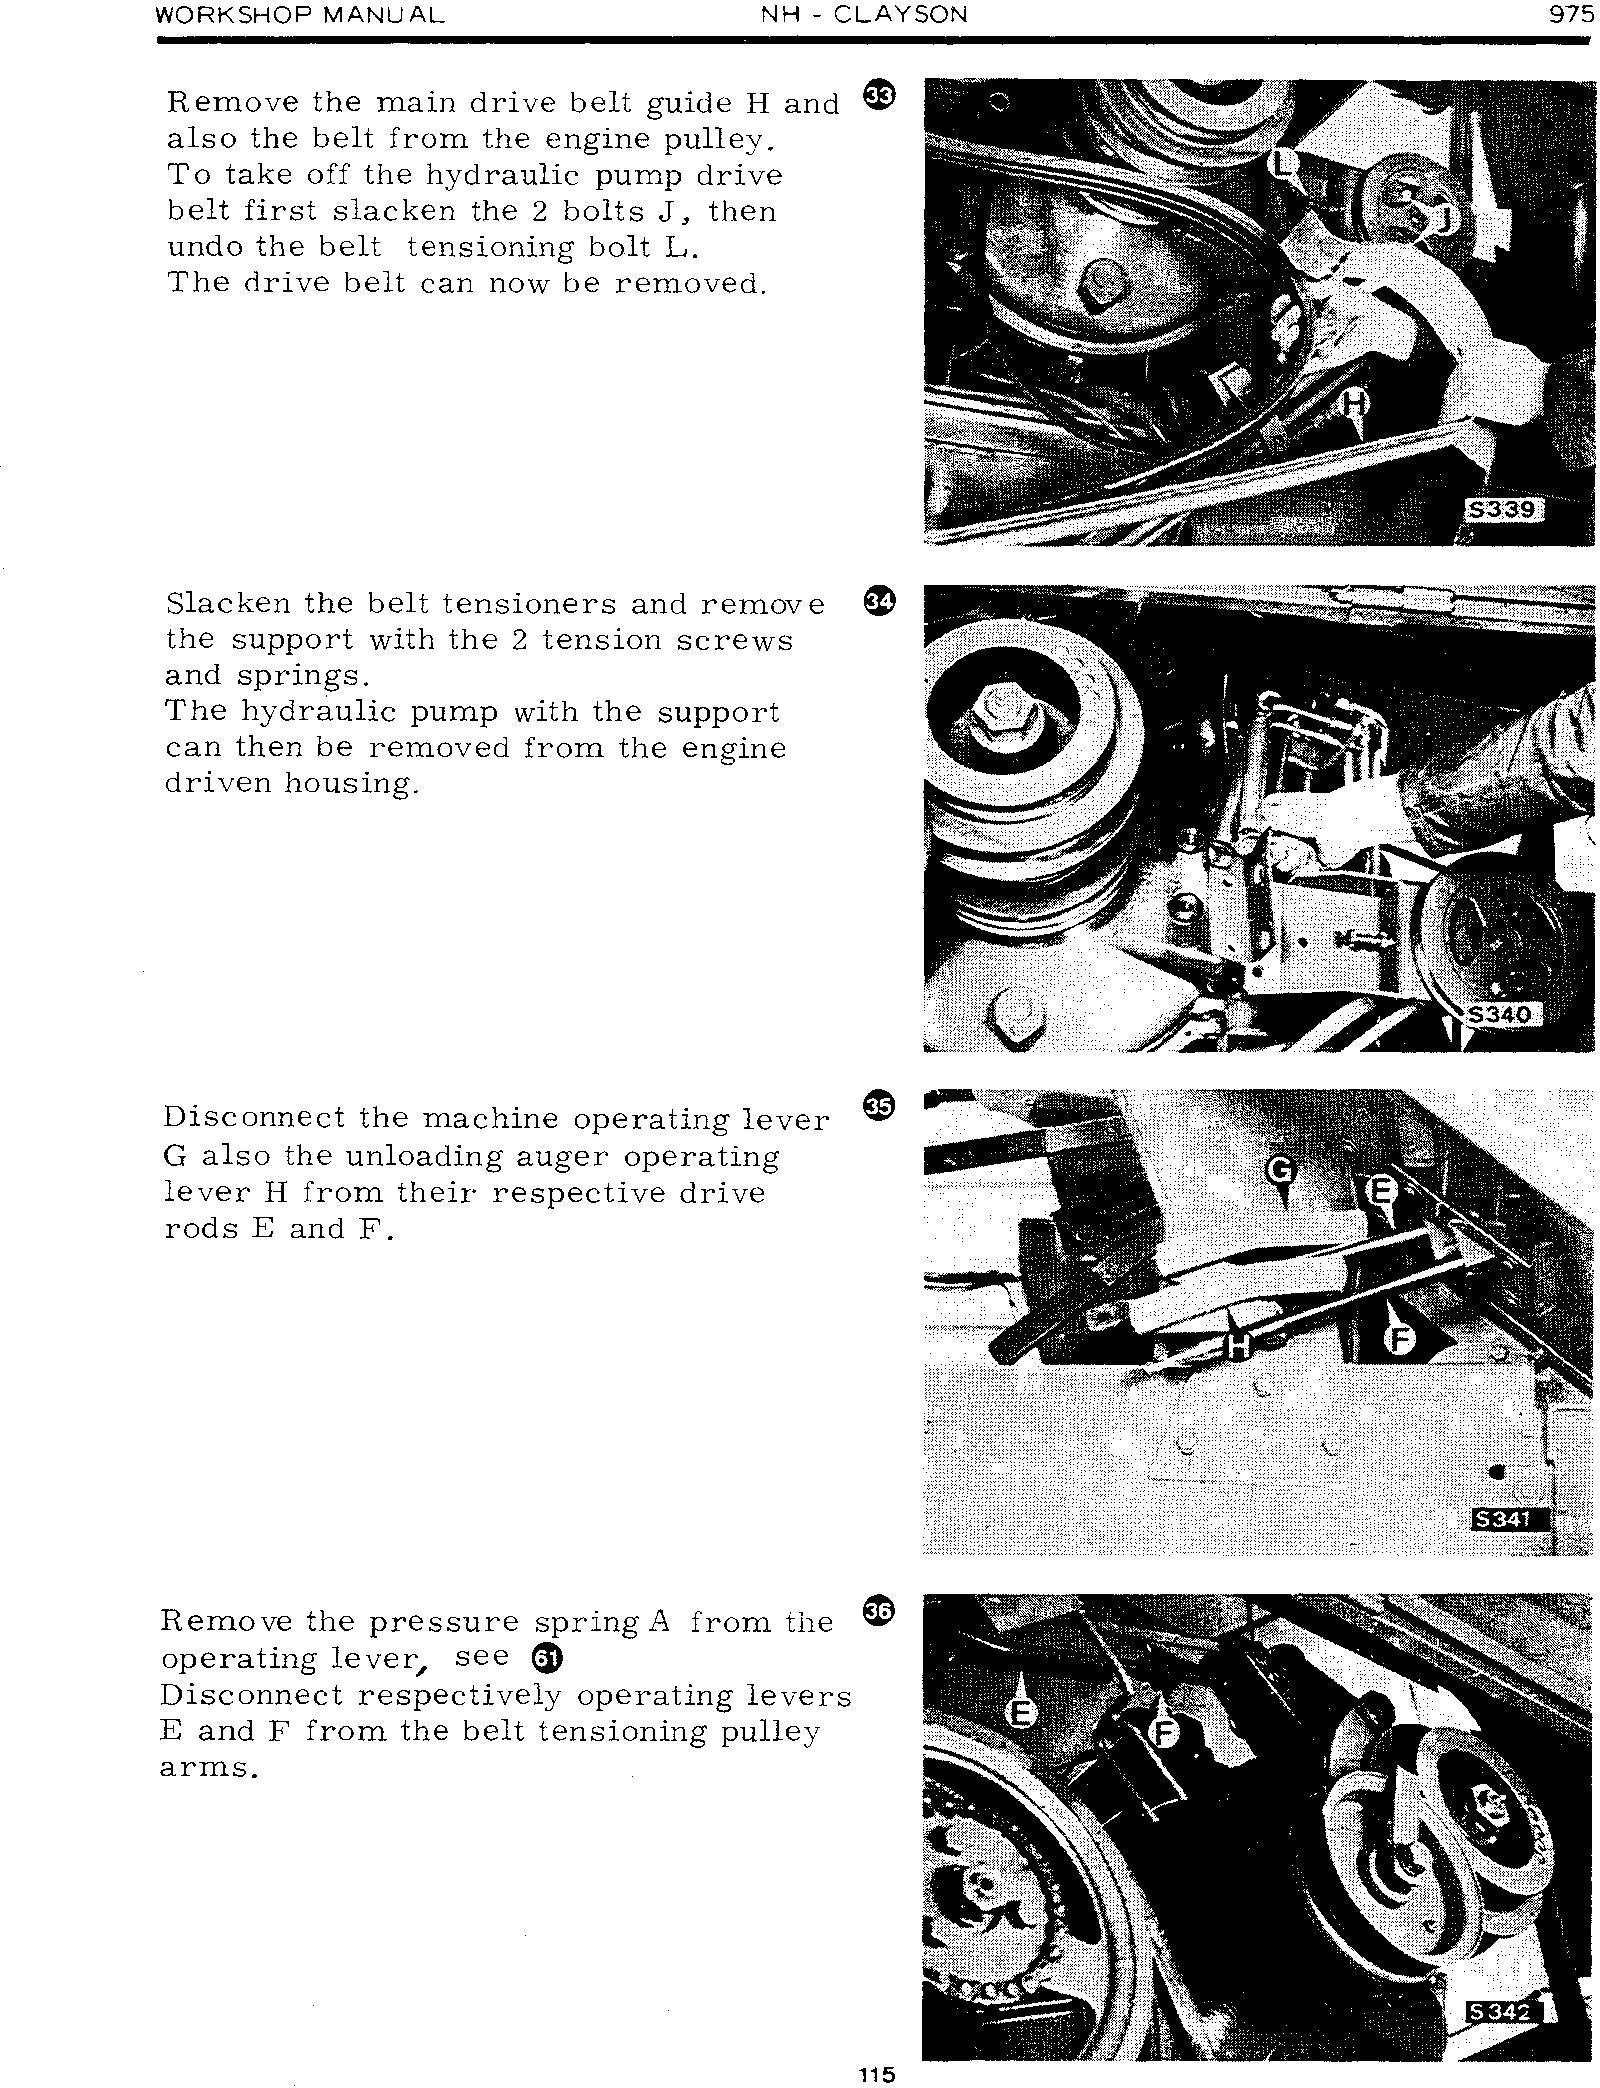 New Holland Workshop Manual 975 Combine Service Manual - 3